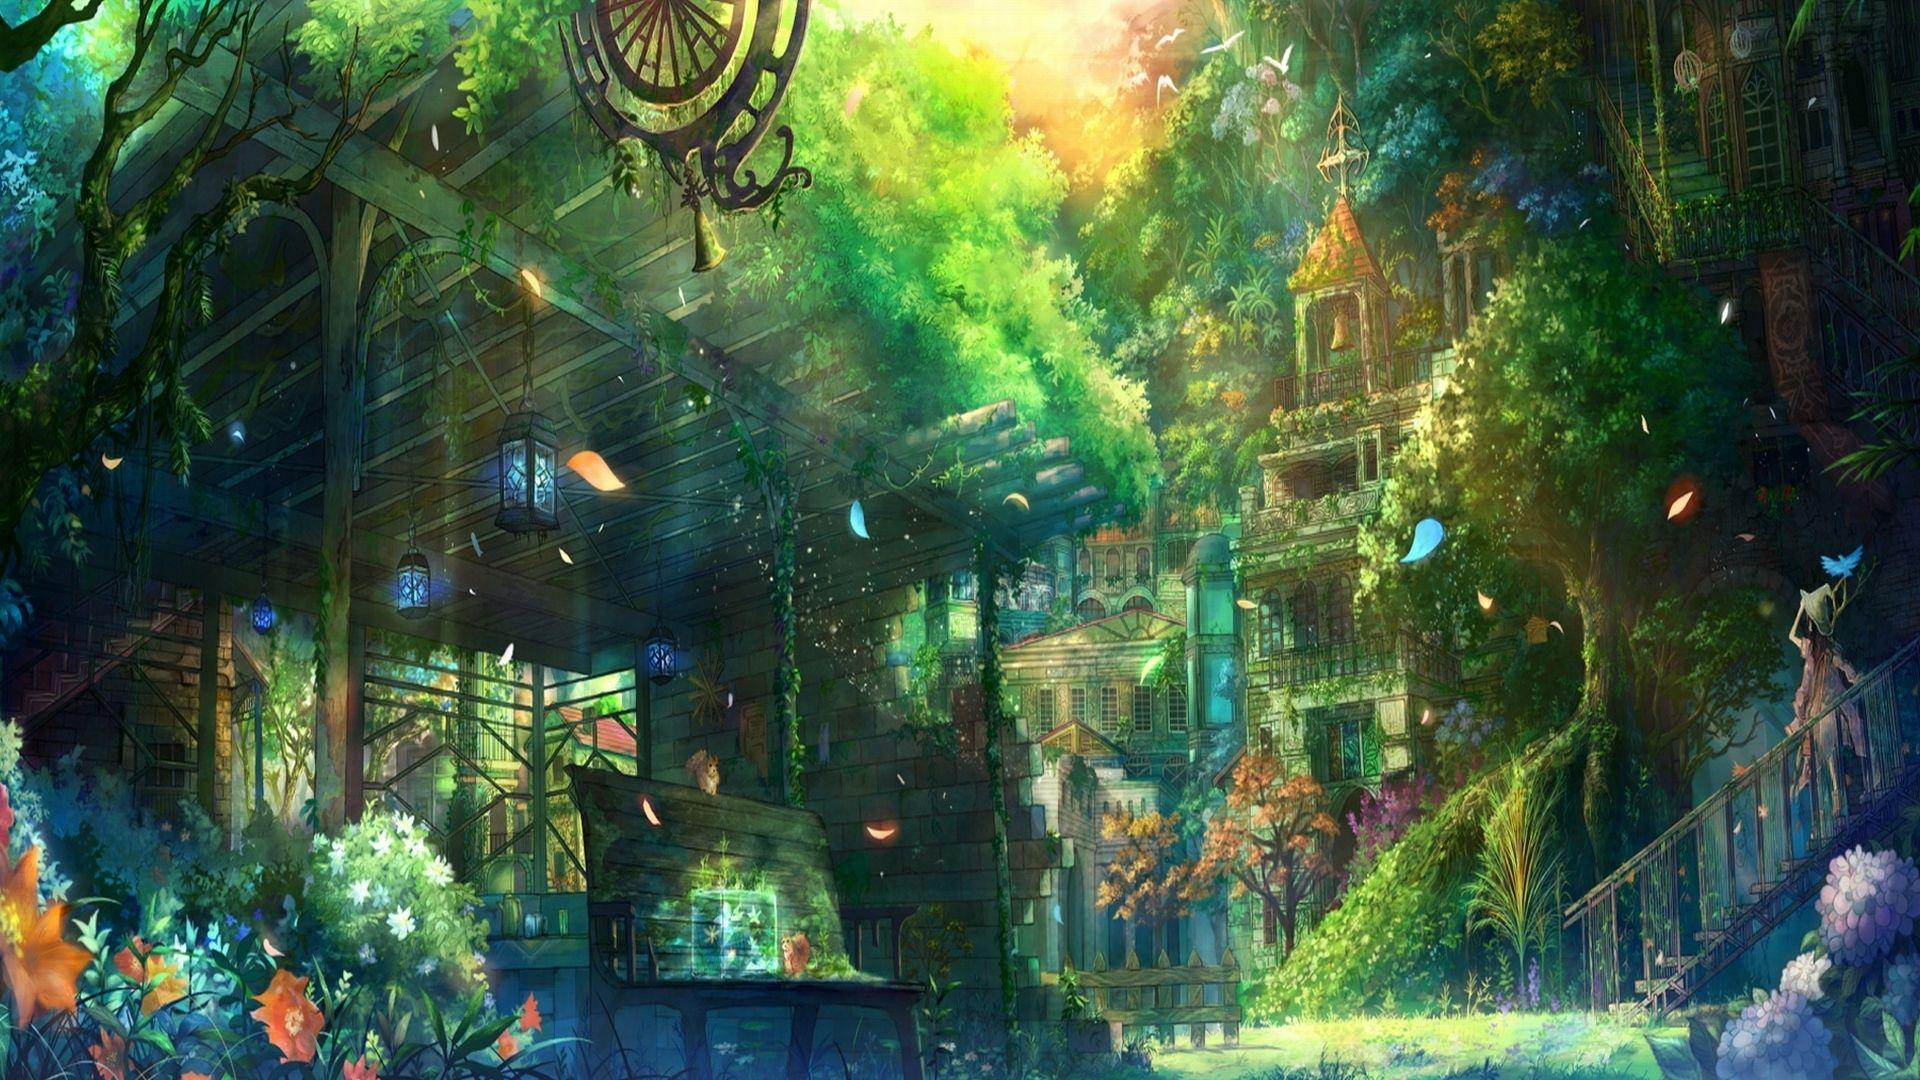 Anime City Wallpaper Anime Scenery Wallpaper Anime Scenery Anime Background